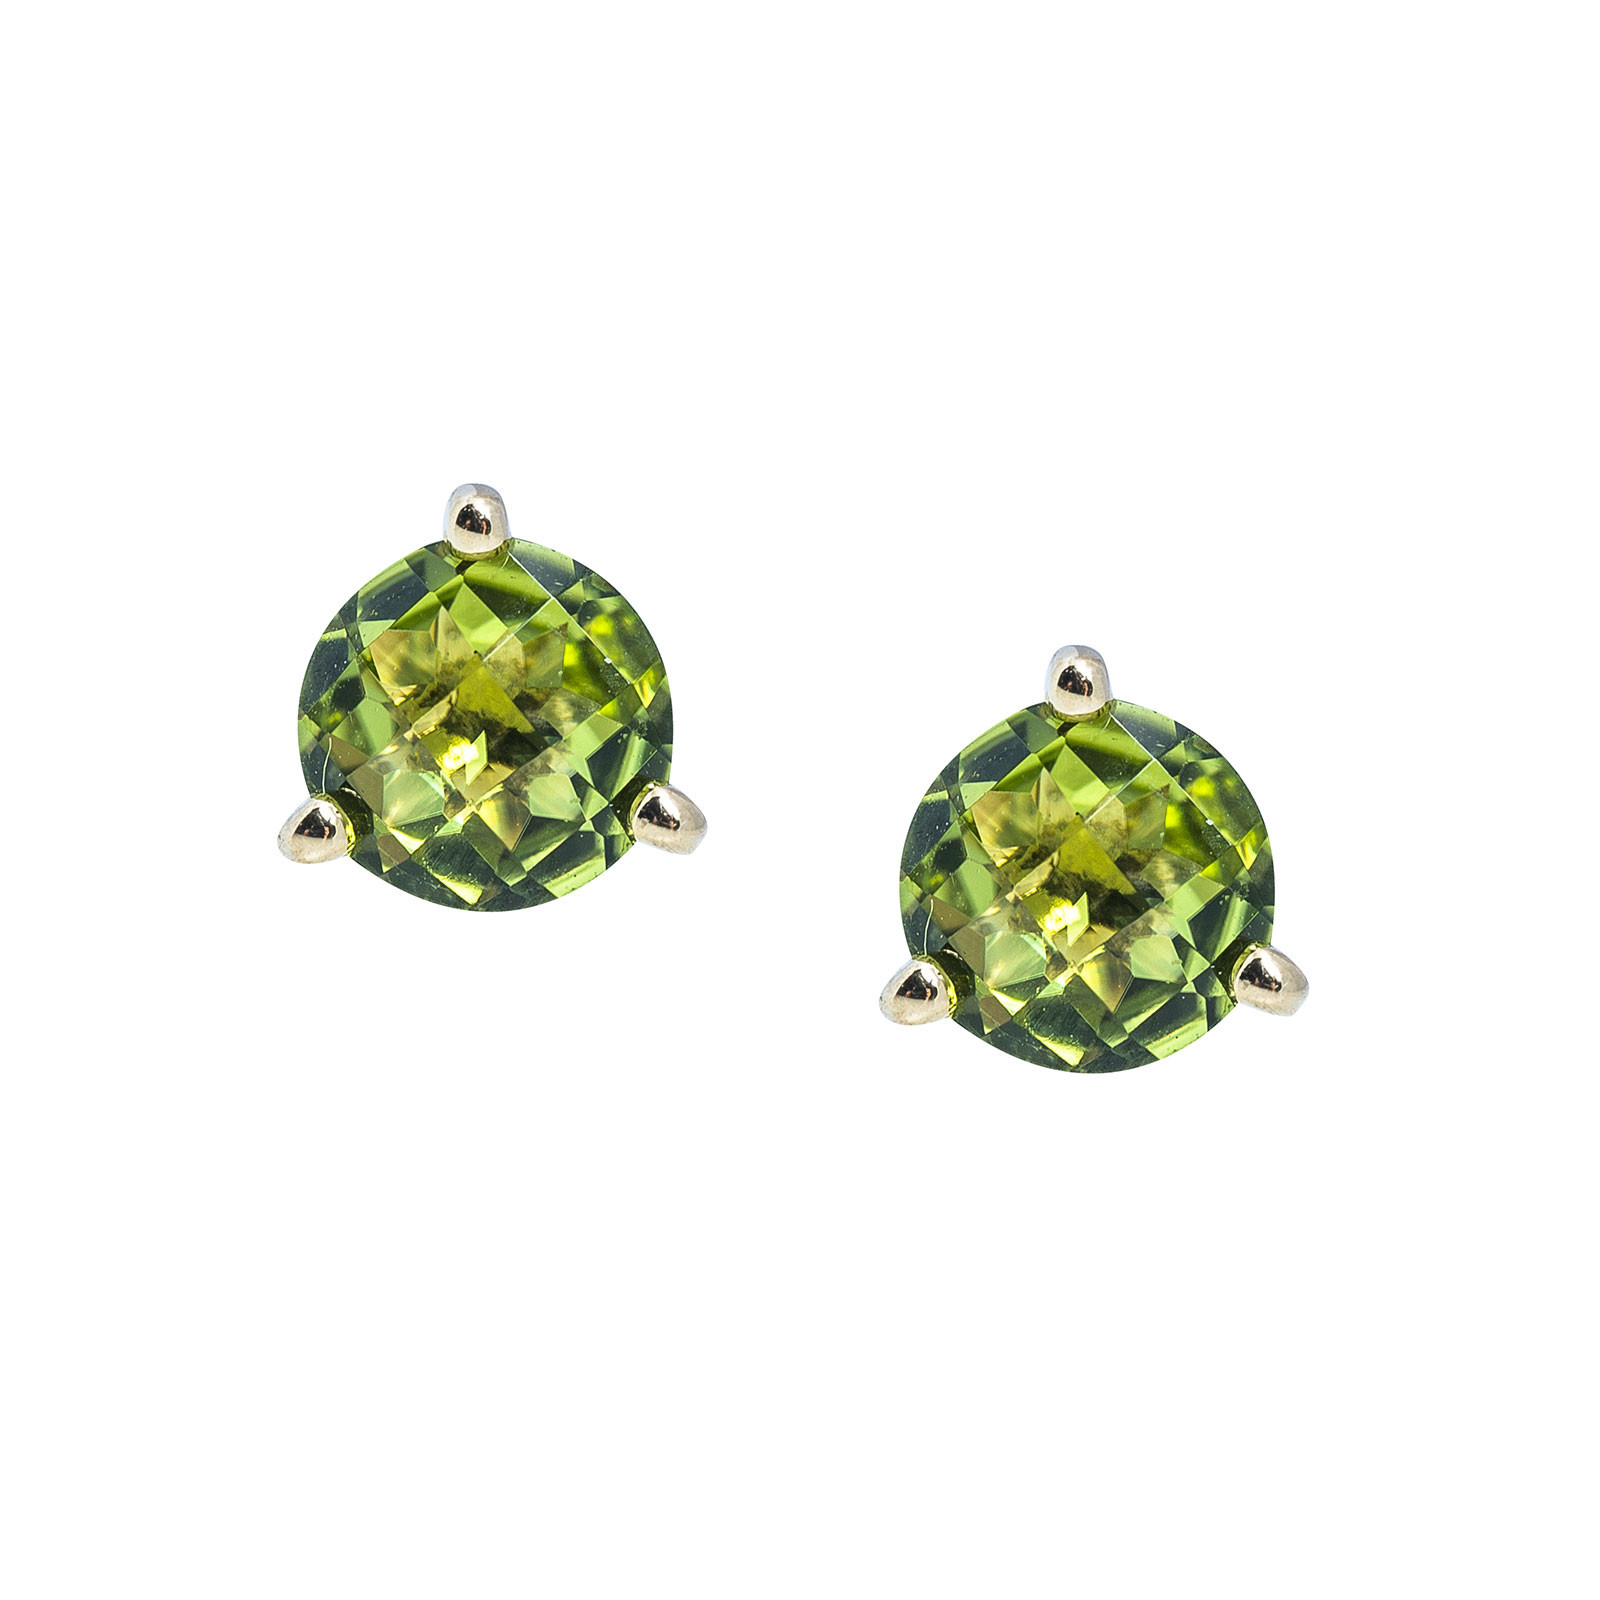 New 1.72 CTW Peridot Stud Earrings